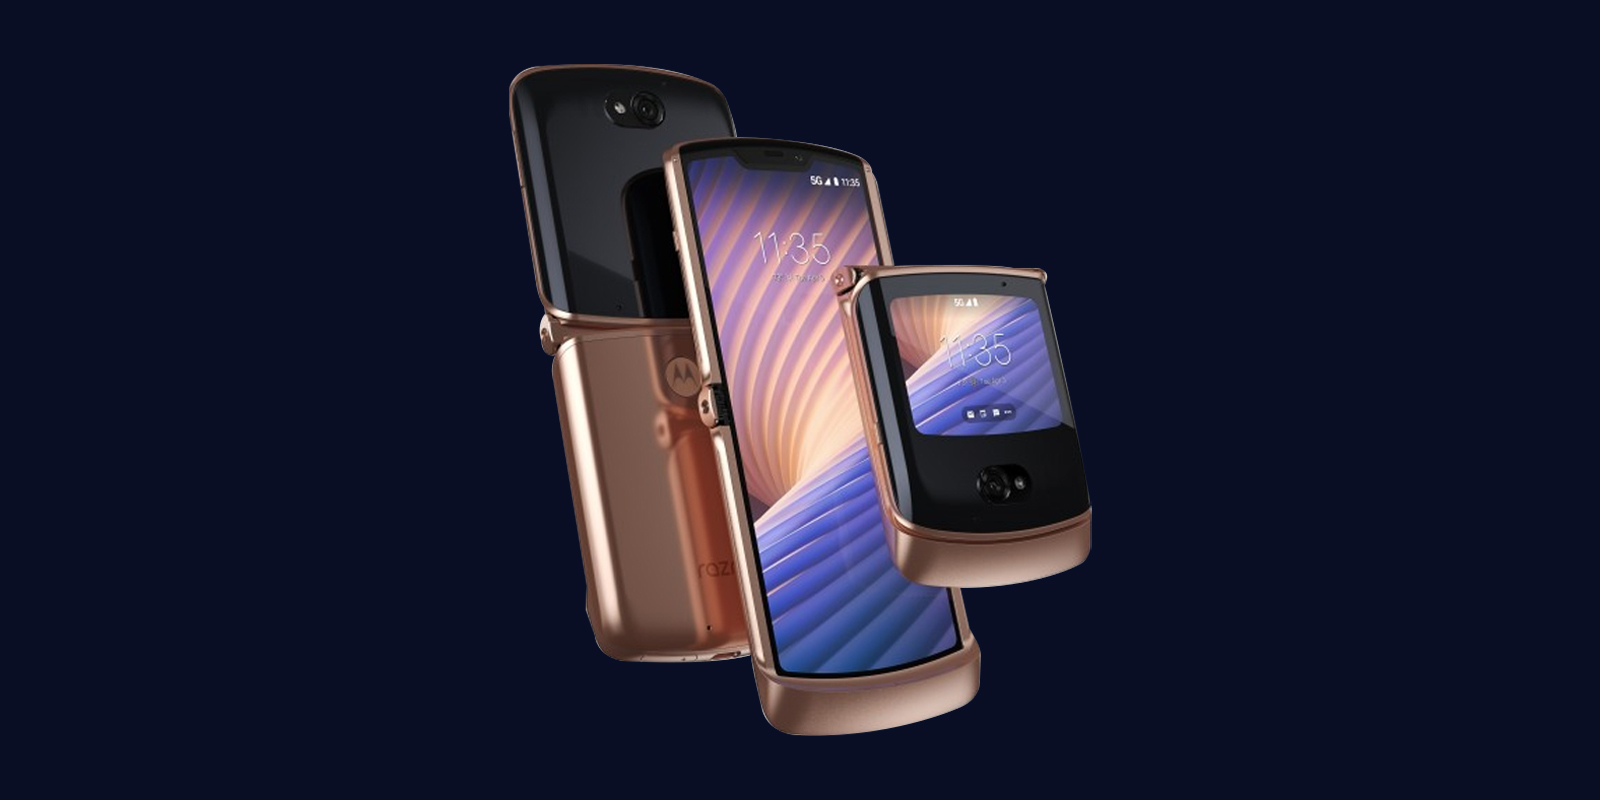 Motorola Razr 2 smartphone